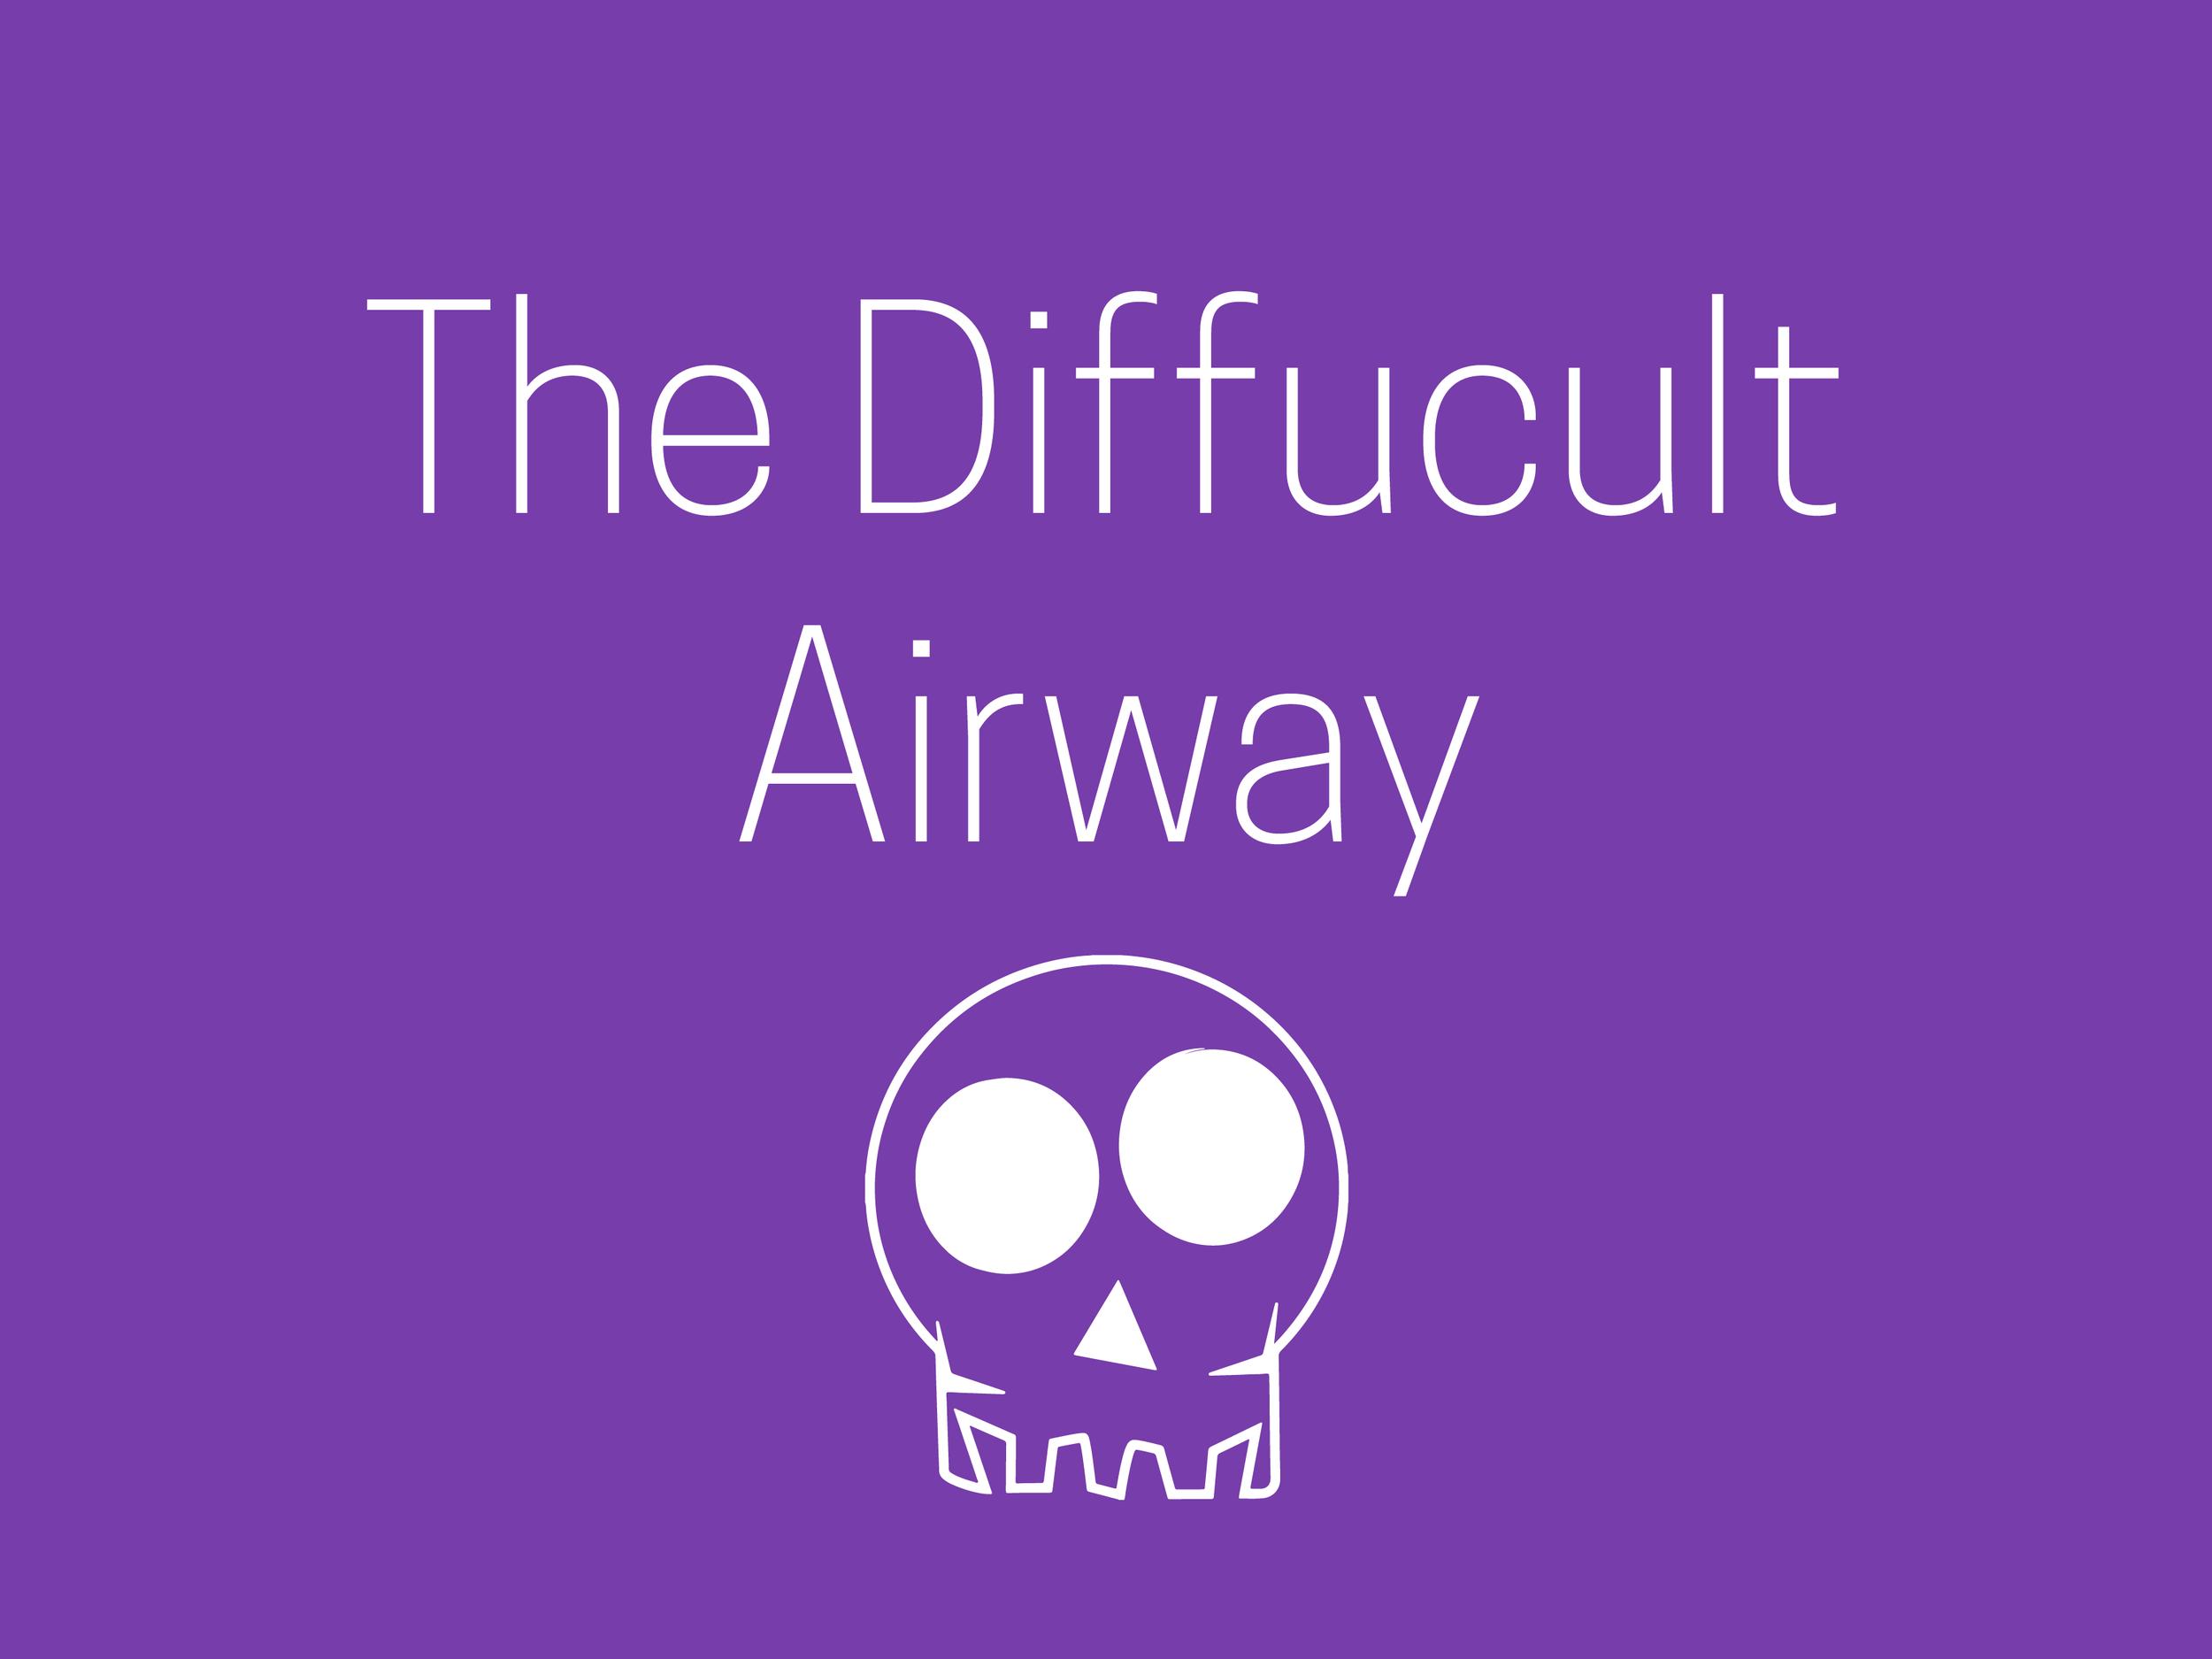 AirwayLit_CategoryArt-01.png